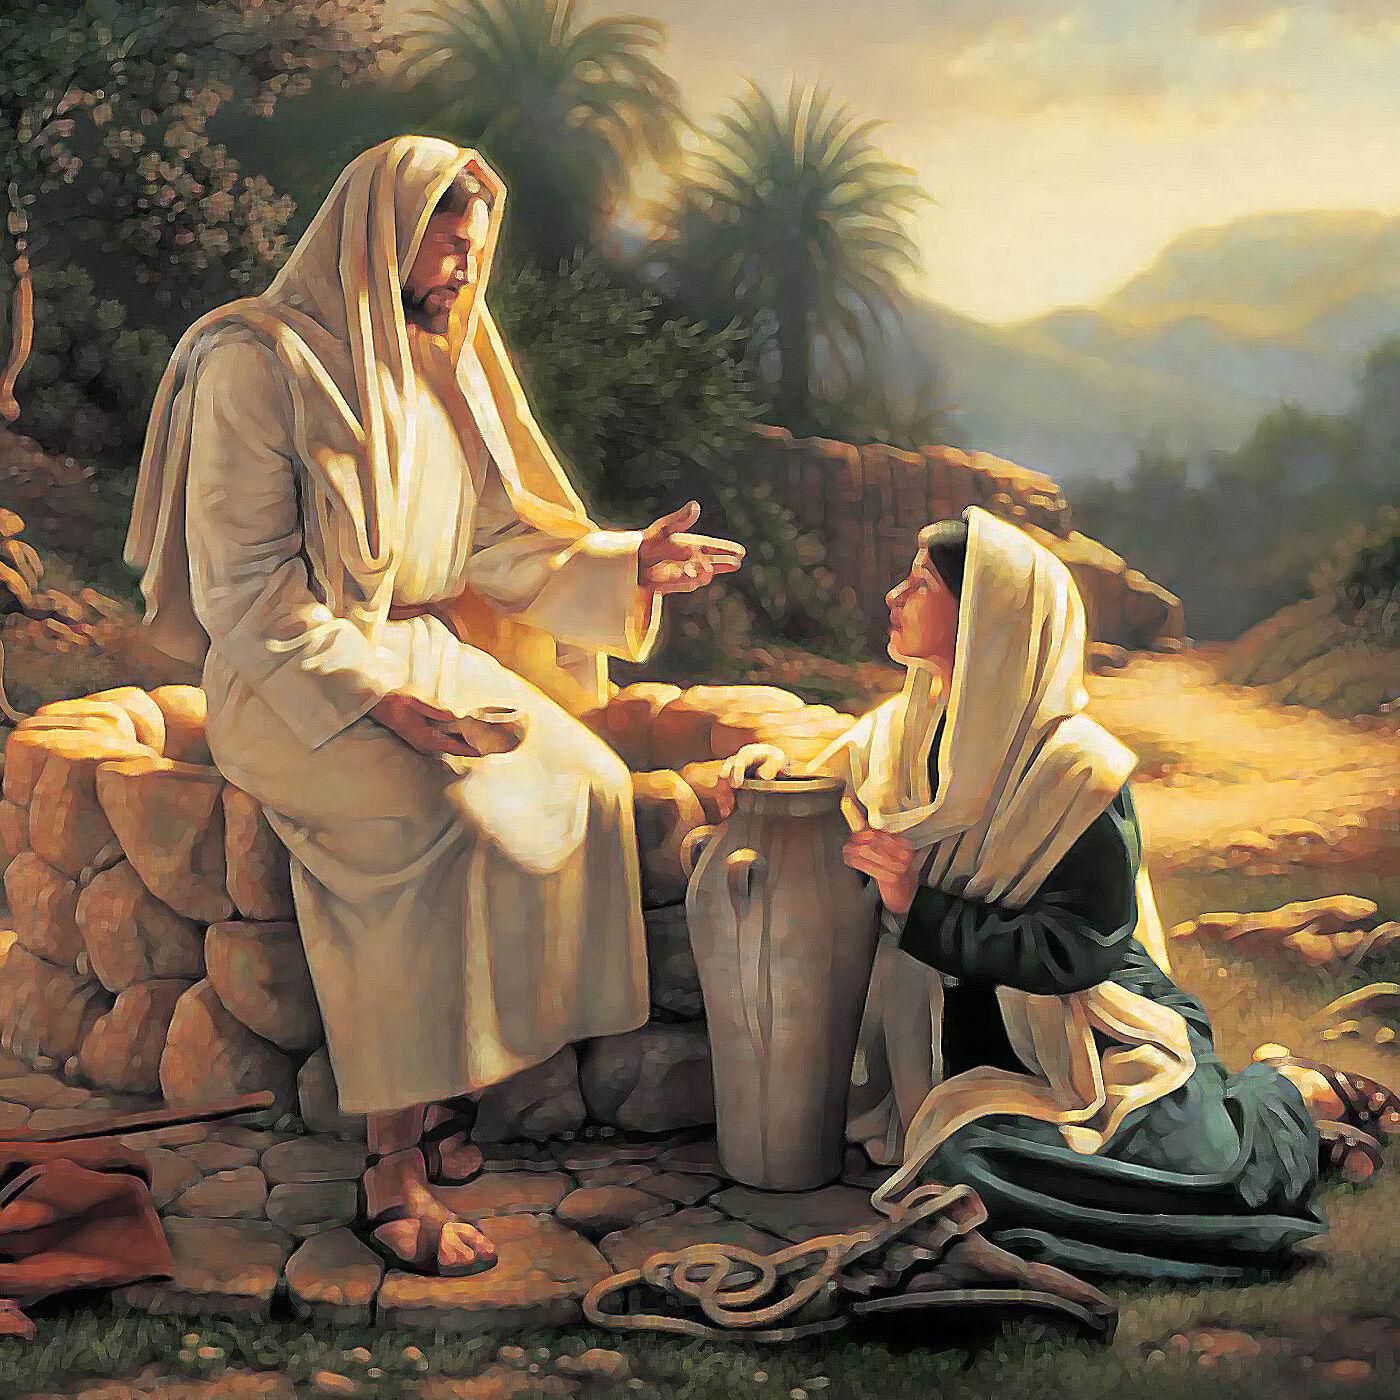 riflessioni sul Vangelo di Venerdì 23 Ottobre 2020 (Lc 12, 54-59) - Apostola Loredana